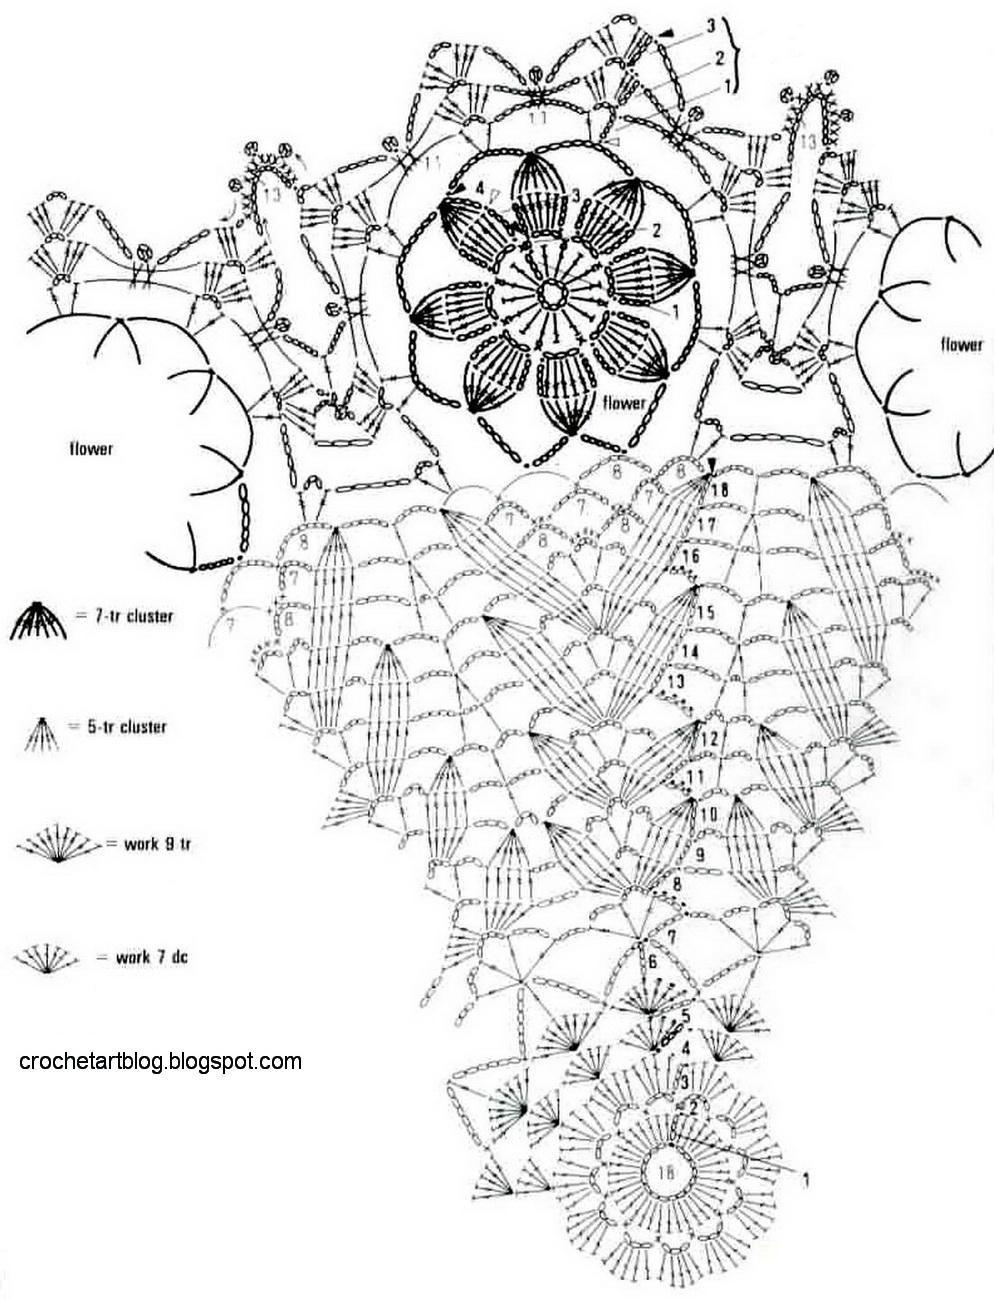 Crochet Art: Crochet Tablecloth Pattern Free - Golden Crochet Doily ...